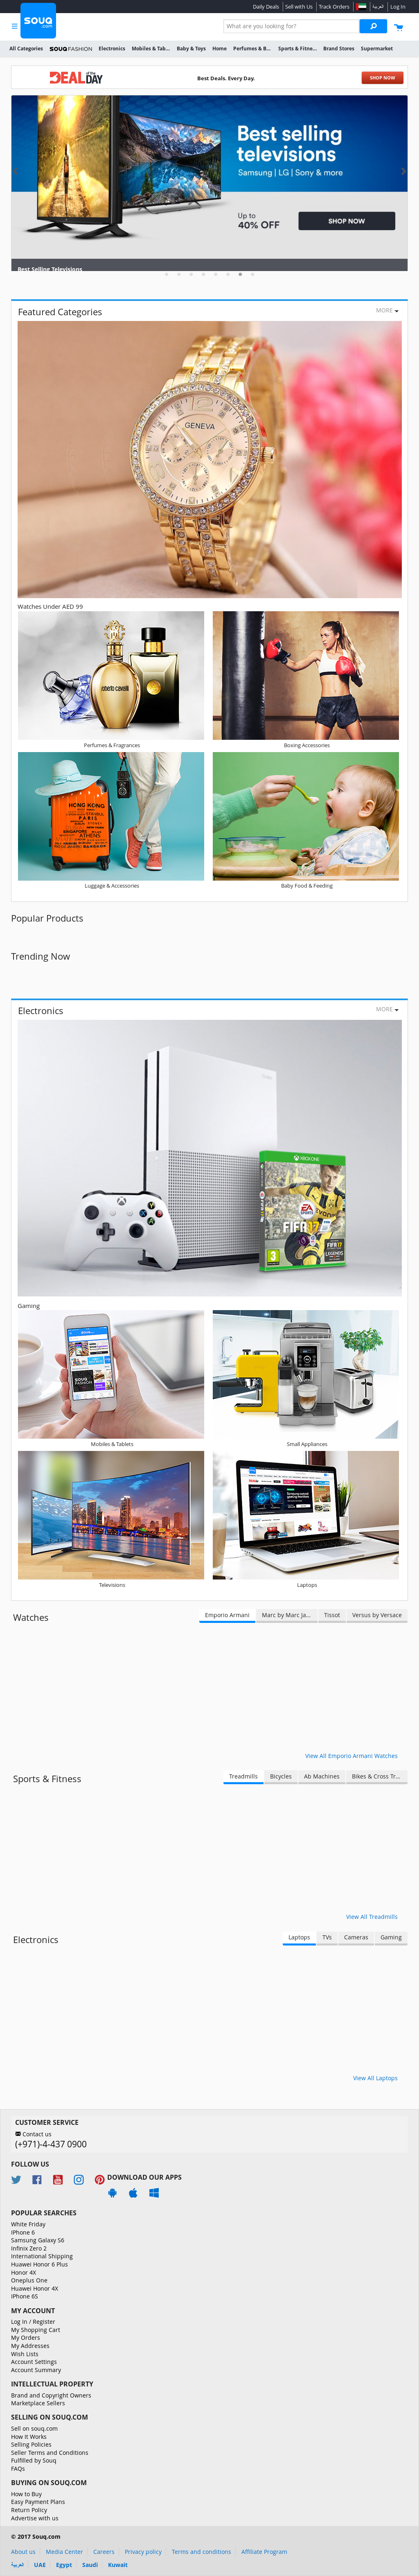 Souq com Uae Competitors, Revenue and Employees - Owler